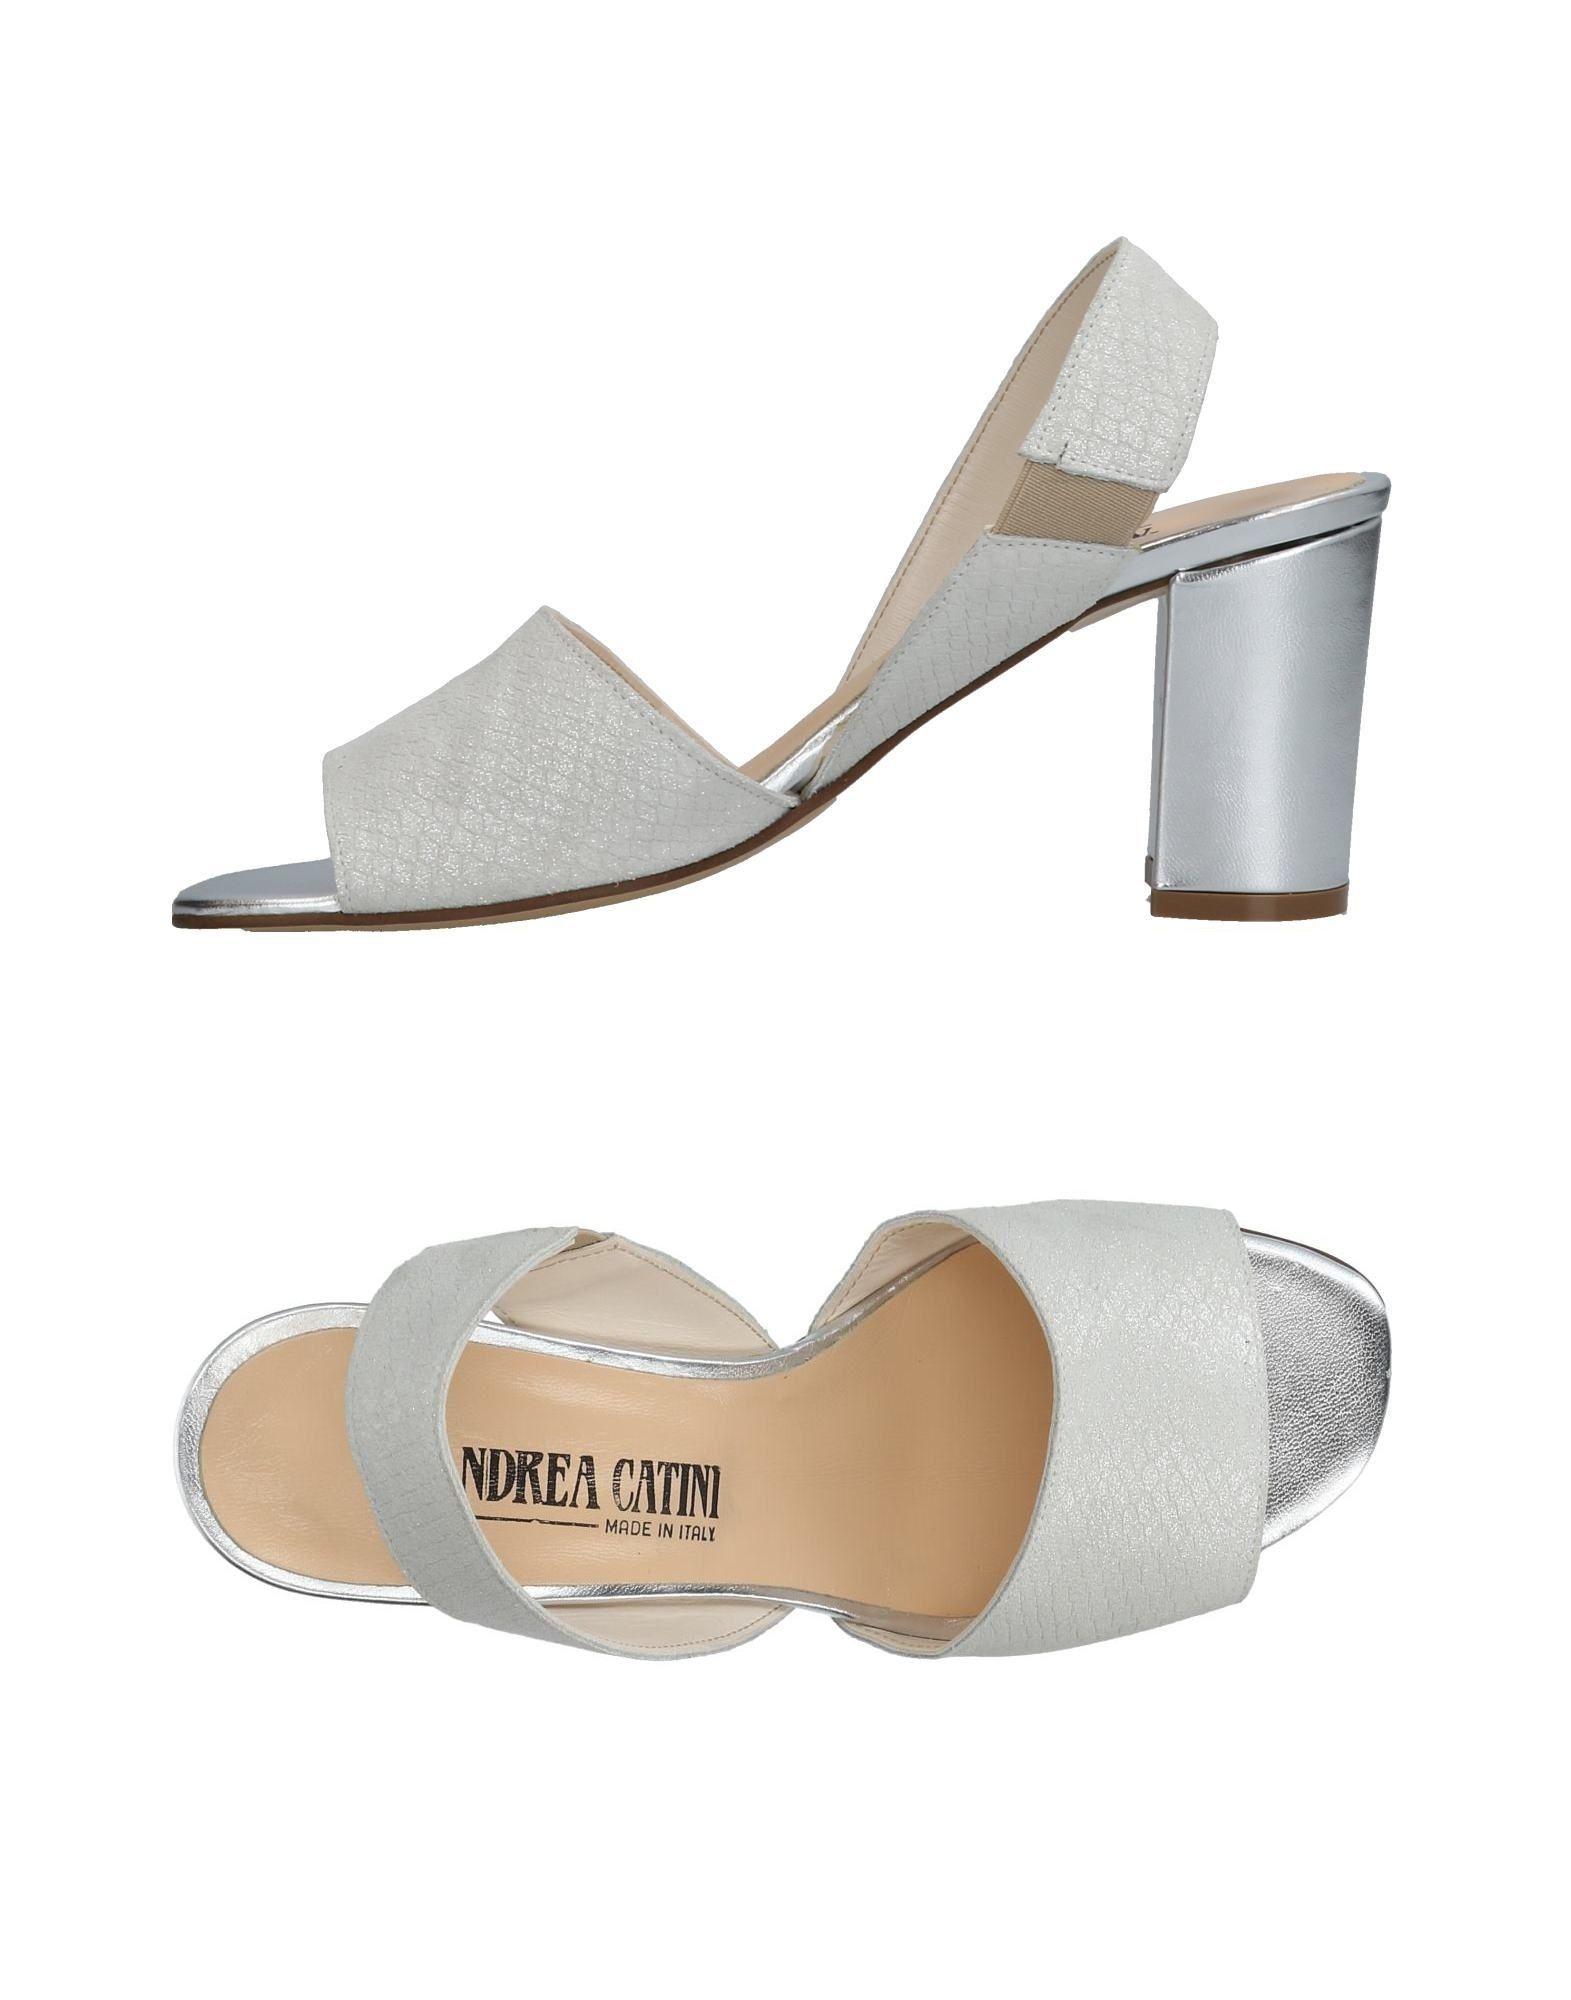 Andrea Catini Sandalen Damen  11430171WL Gute Qualität beliebte Schuhe